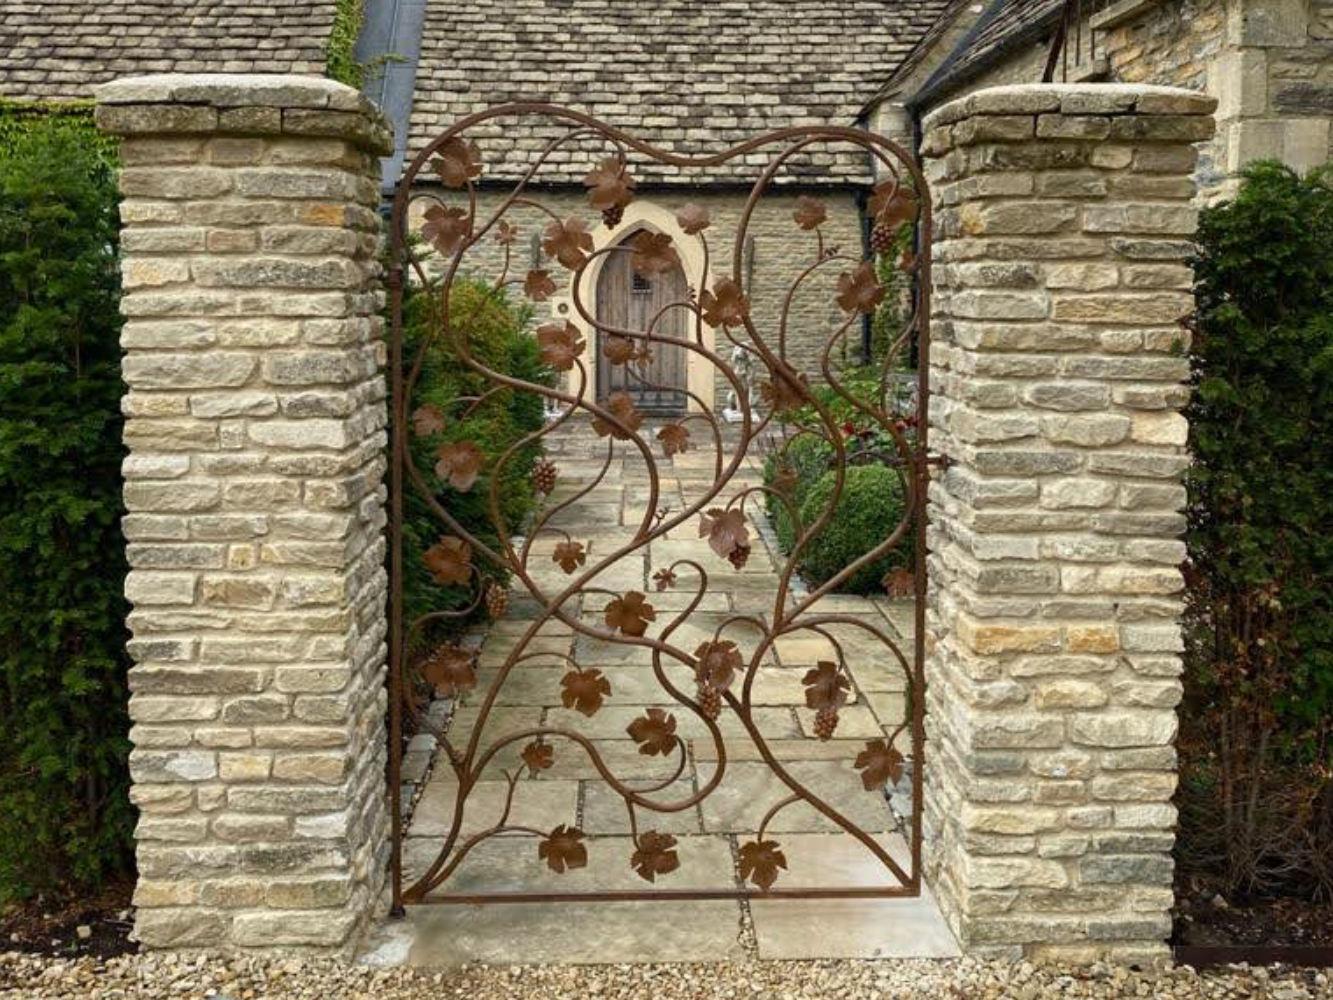 vine-leaf-gate-forged-artistic-ironwork-feature